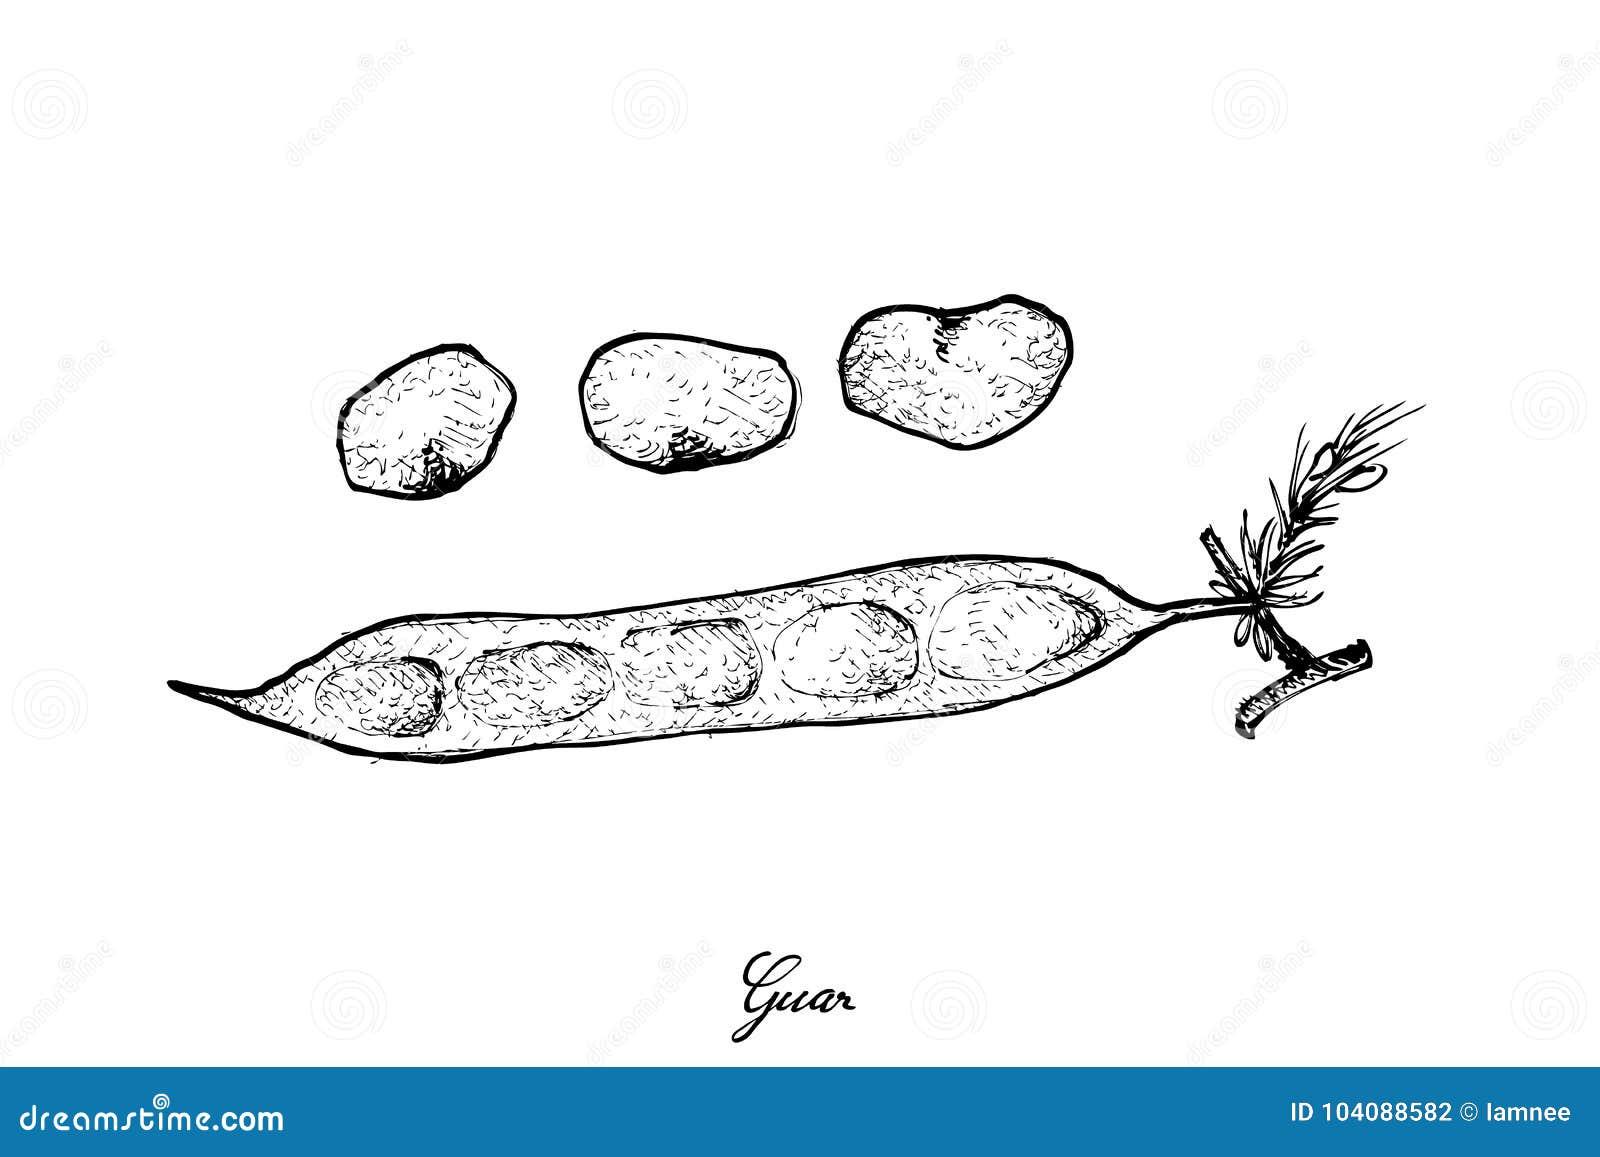 Mano dibujada de haba de racimo o del guar fresca